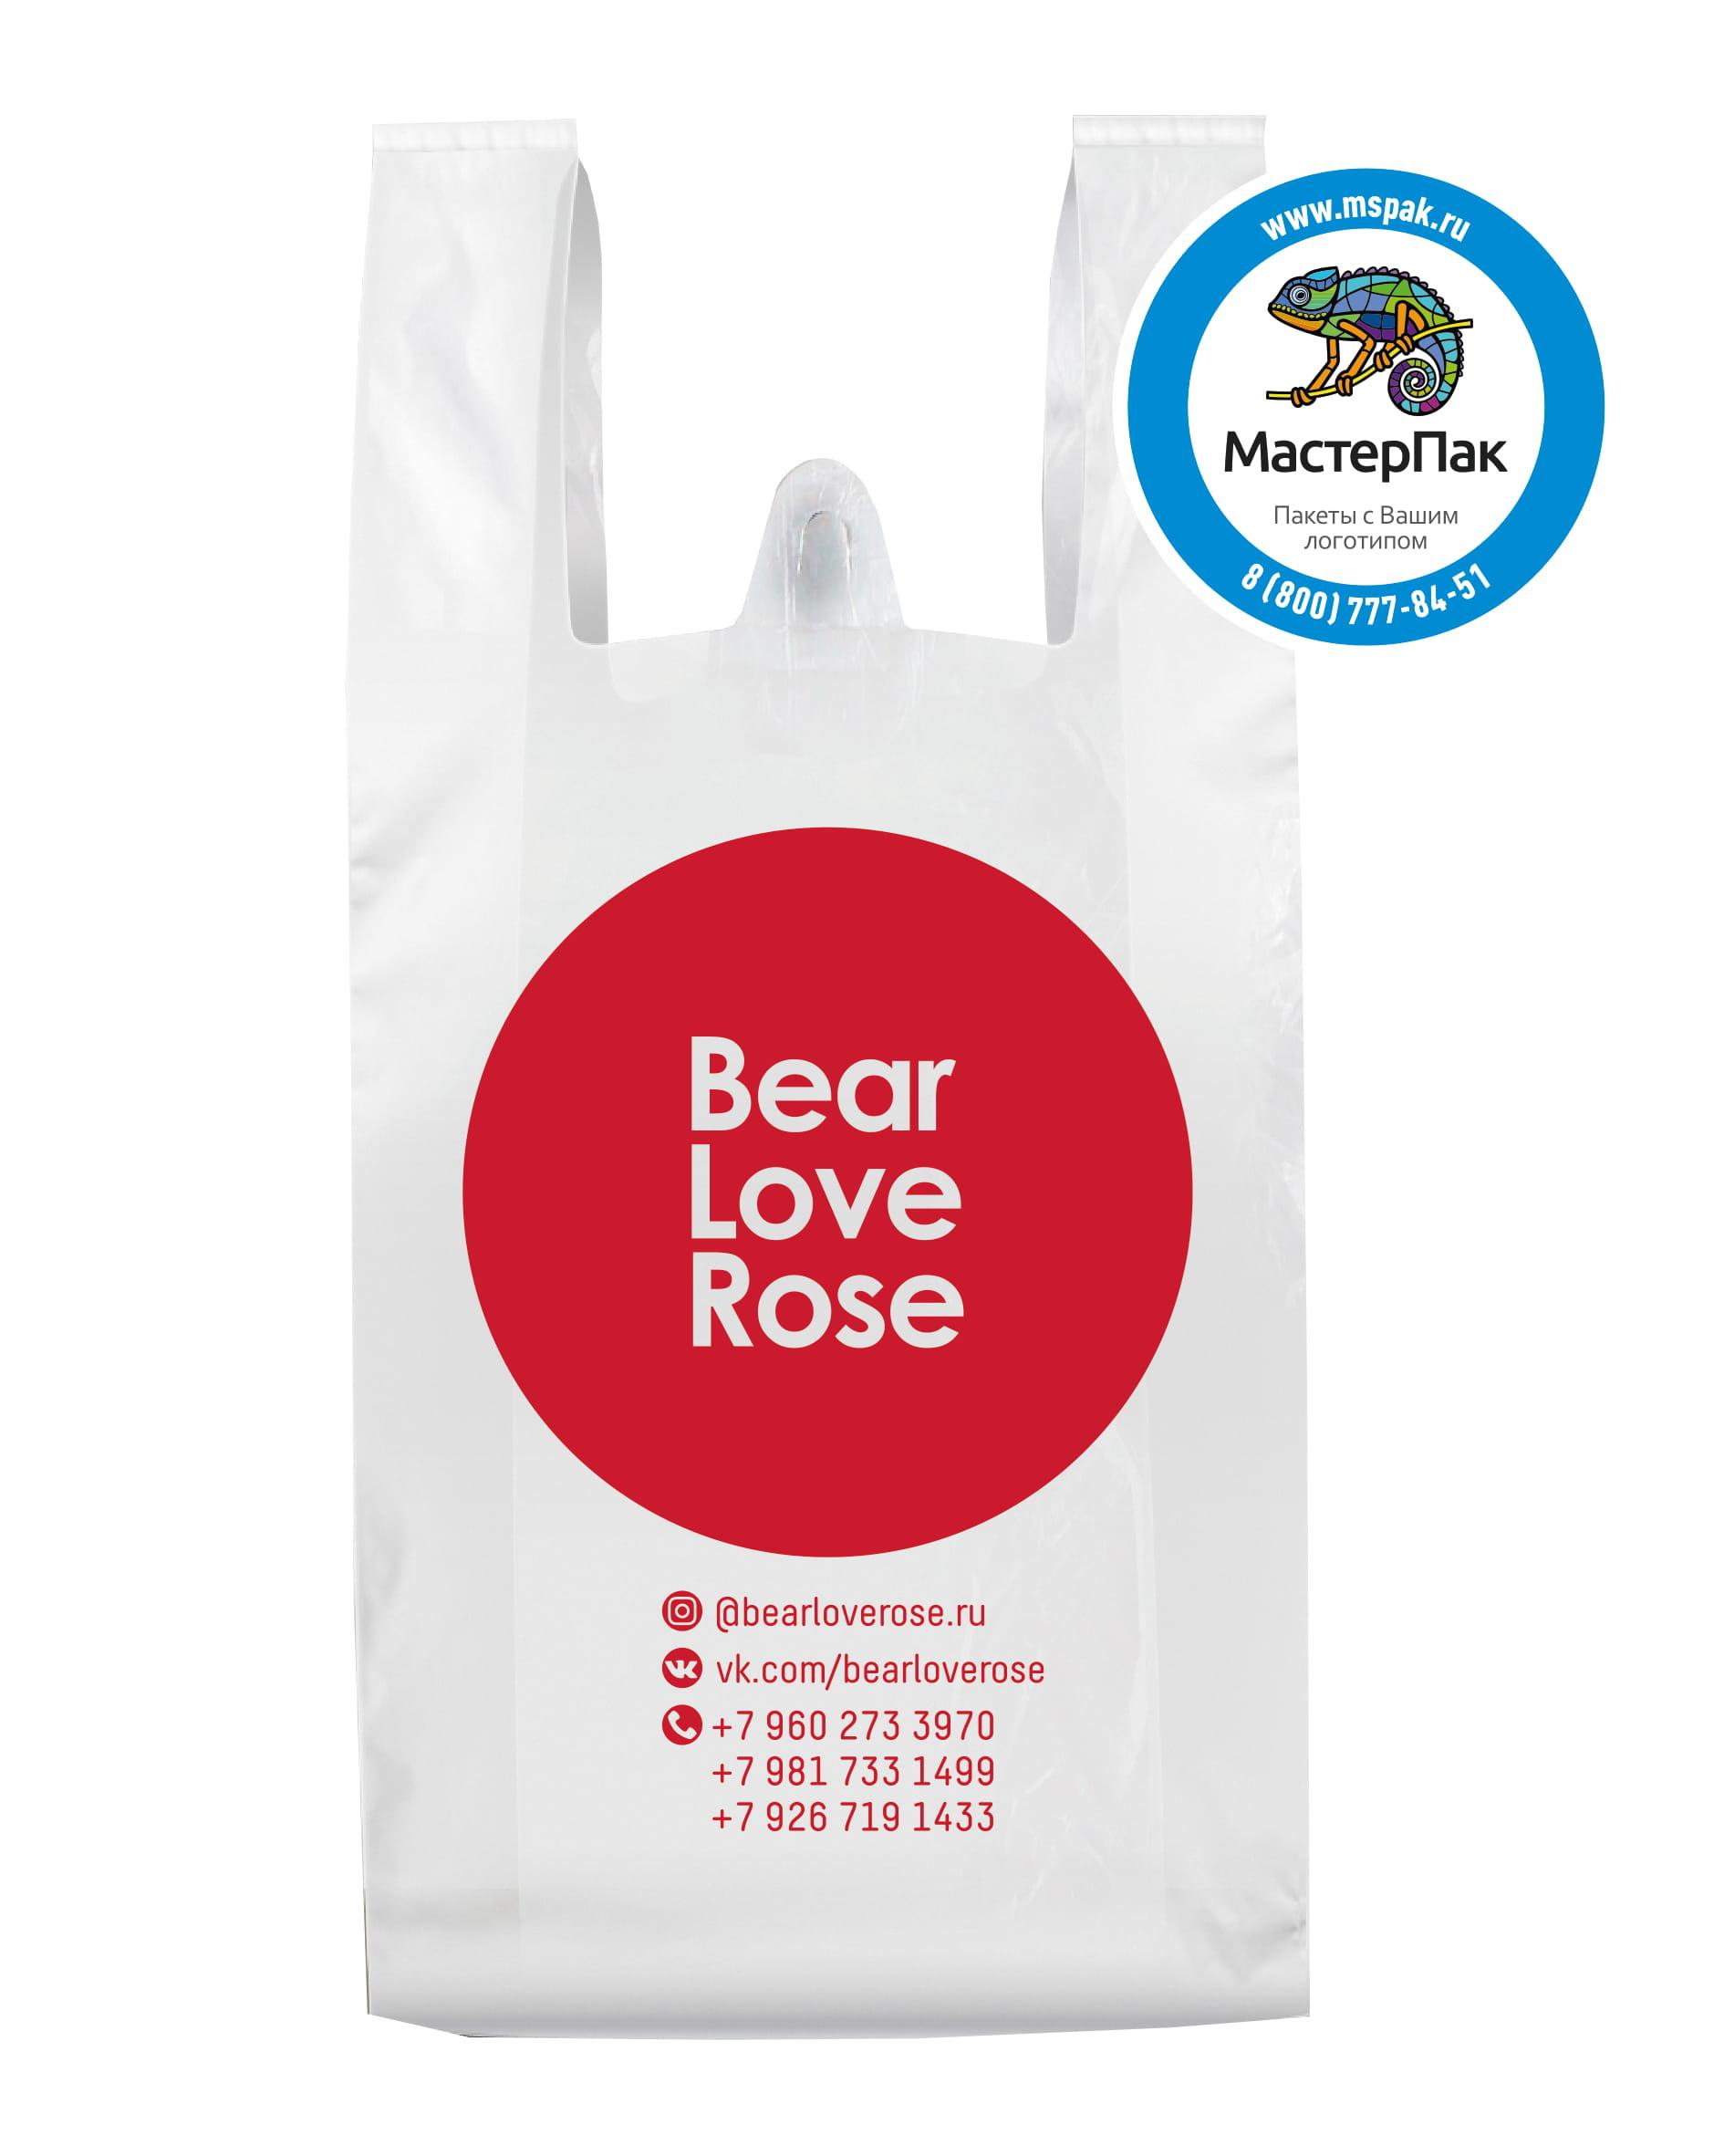 Пакет-майка ПНД с логотипом Bear love rose, Воронеж, 23 мкм, 40*60